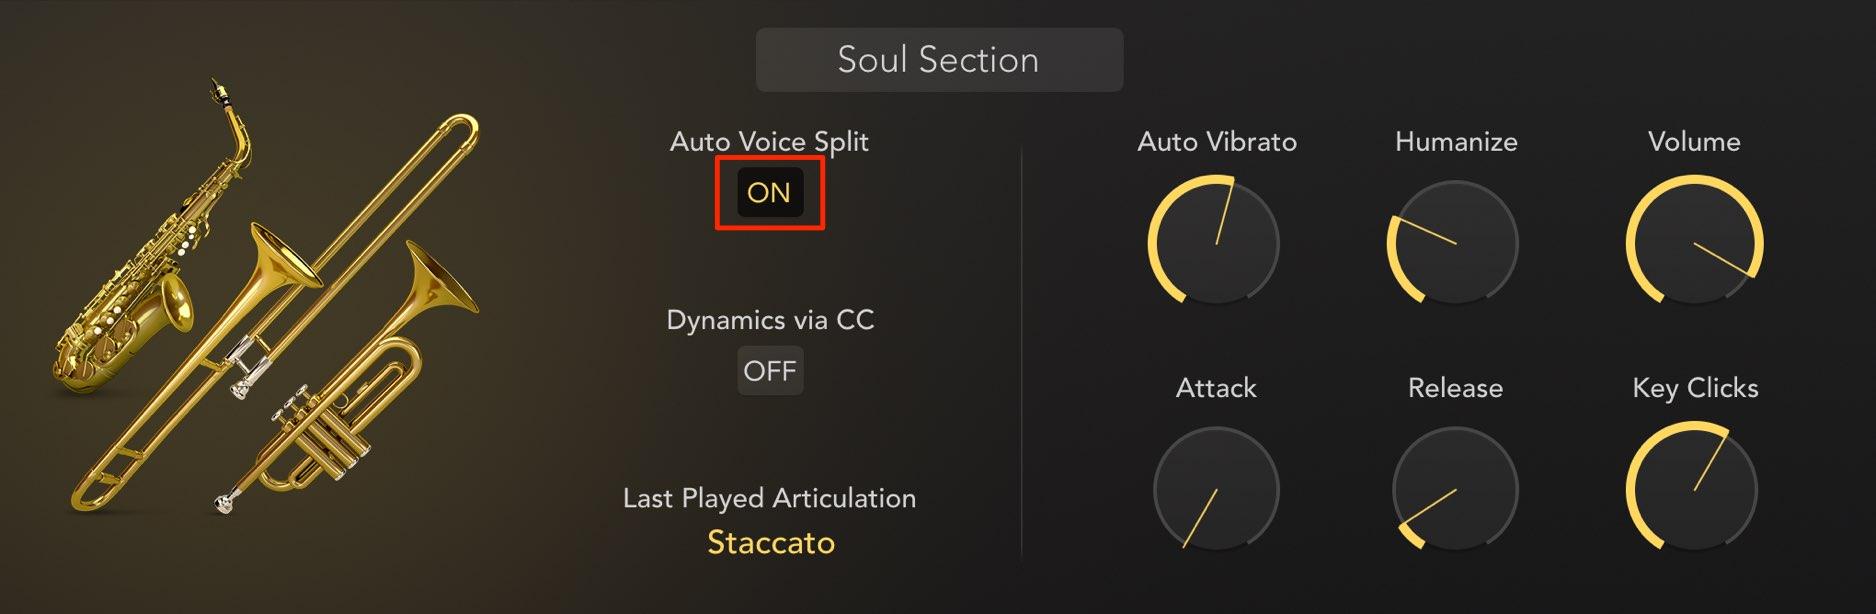 Auto Voice Split